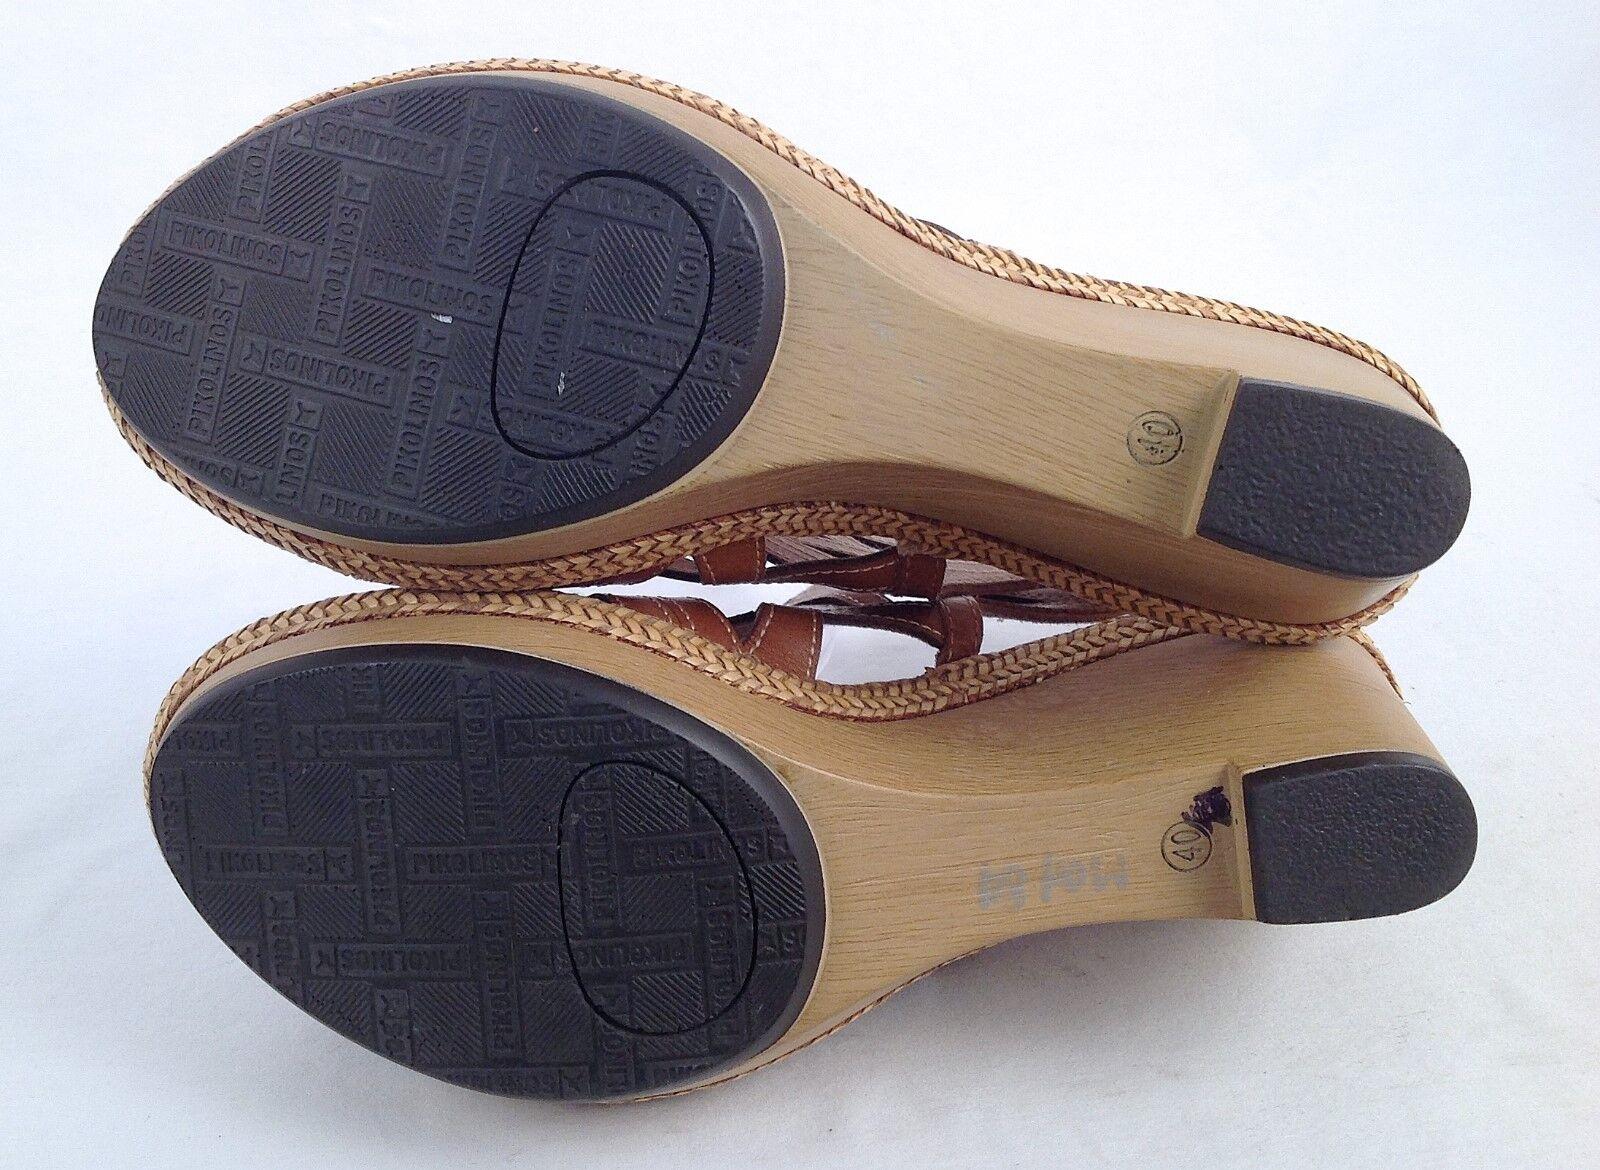 New   Pikolinos Leder Lazer Cutout Slingbacks Wedge Sandales- (P30) Größe 10 US  (P30) Sandales- 60ac36